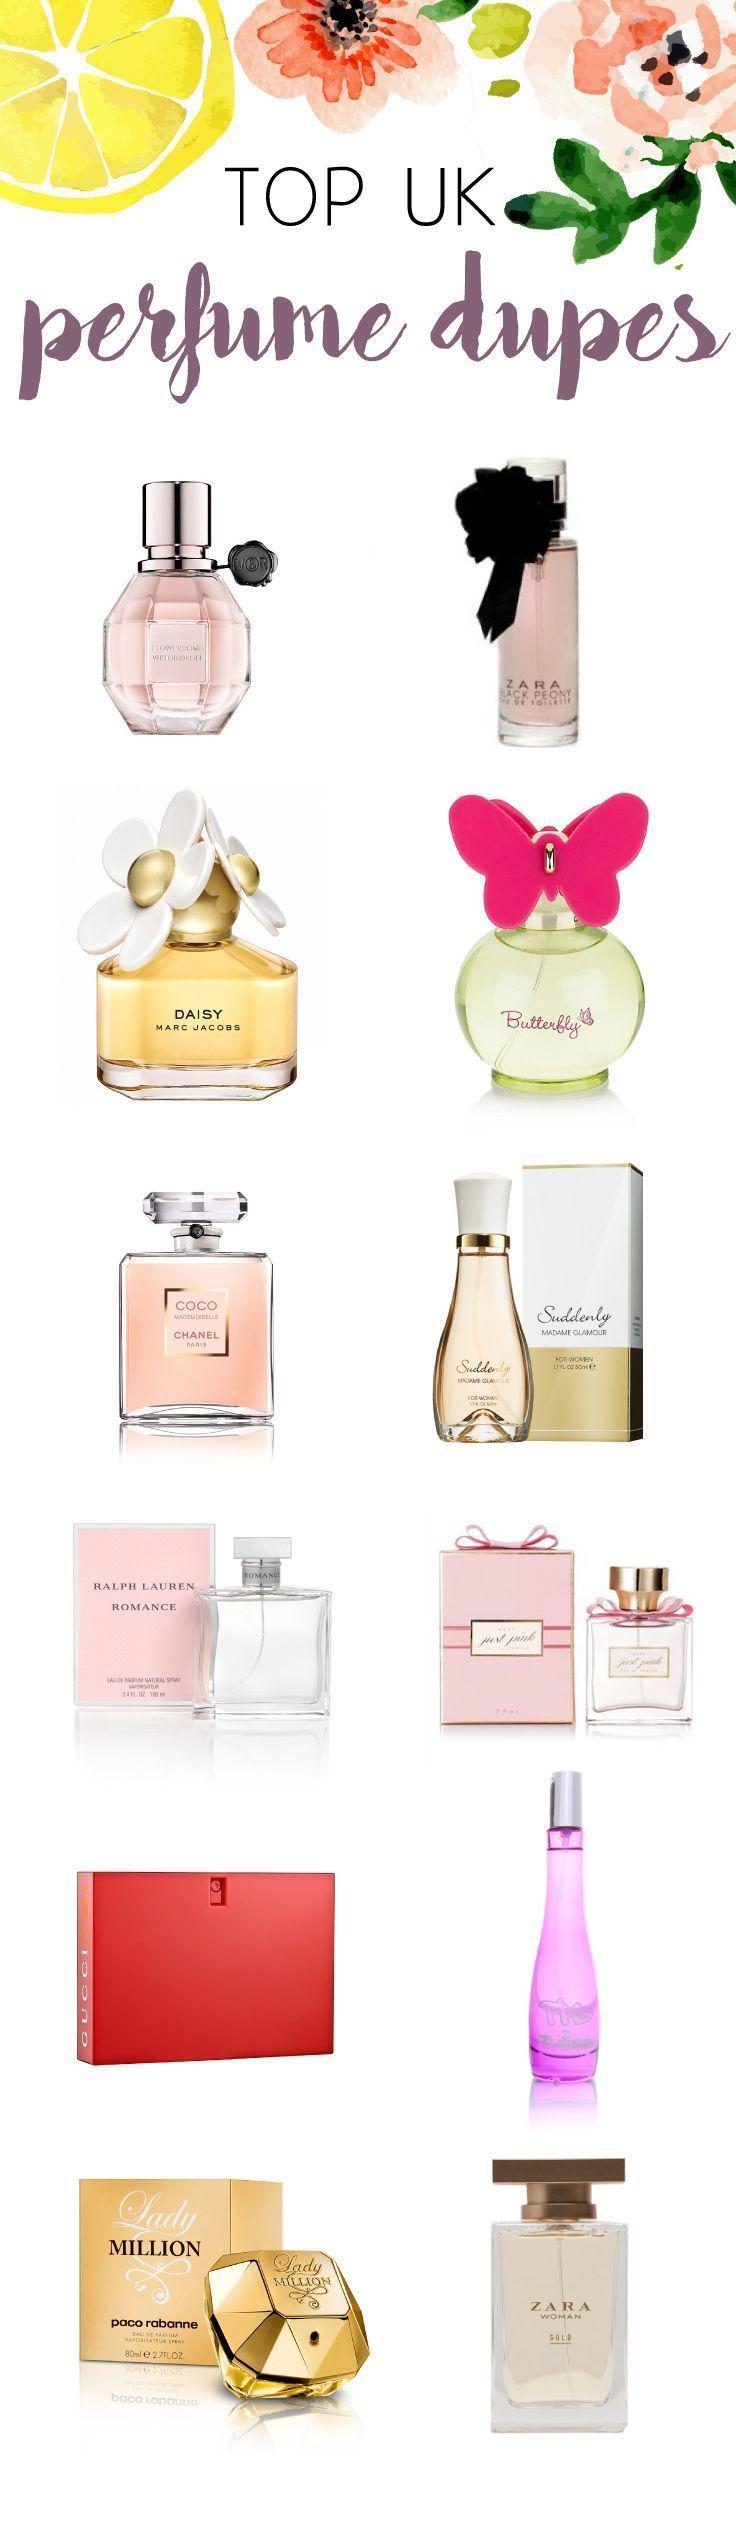 Top 8 UK Perfume Dupes drugstore Dupes Perfume Top